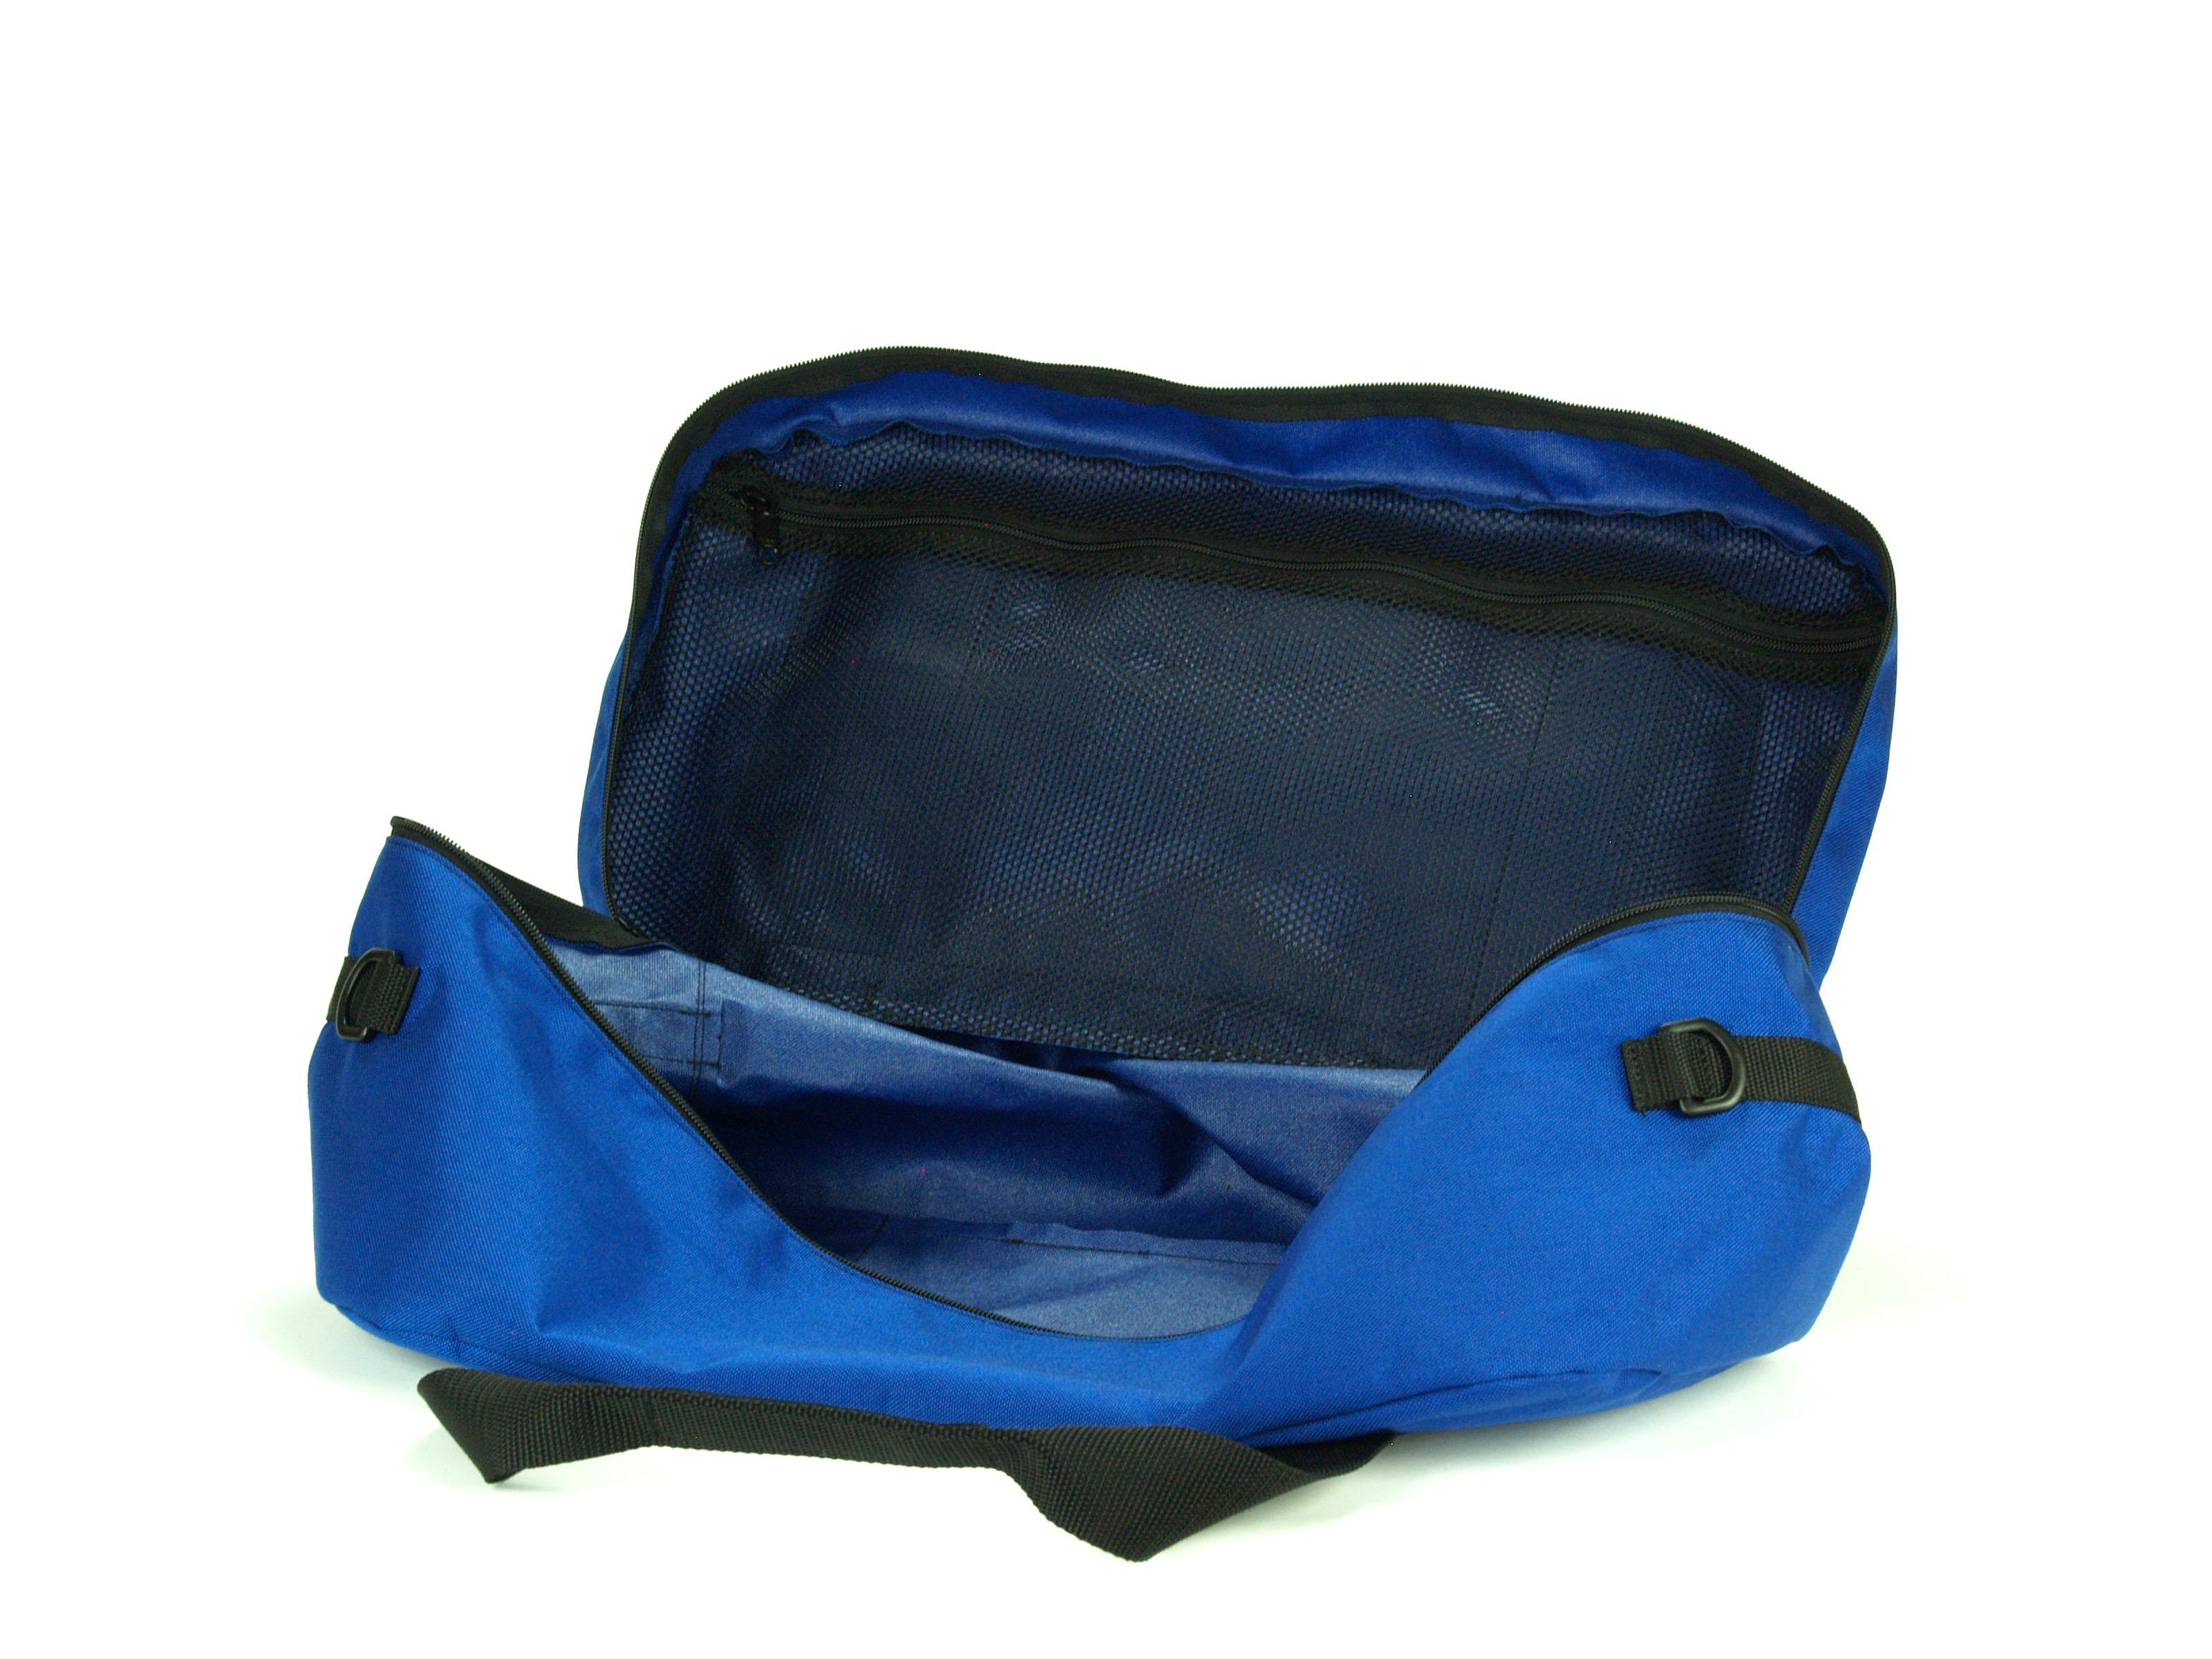 Universal Bag Liner For 50 55 Liter Givi Shad Top Cases